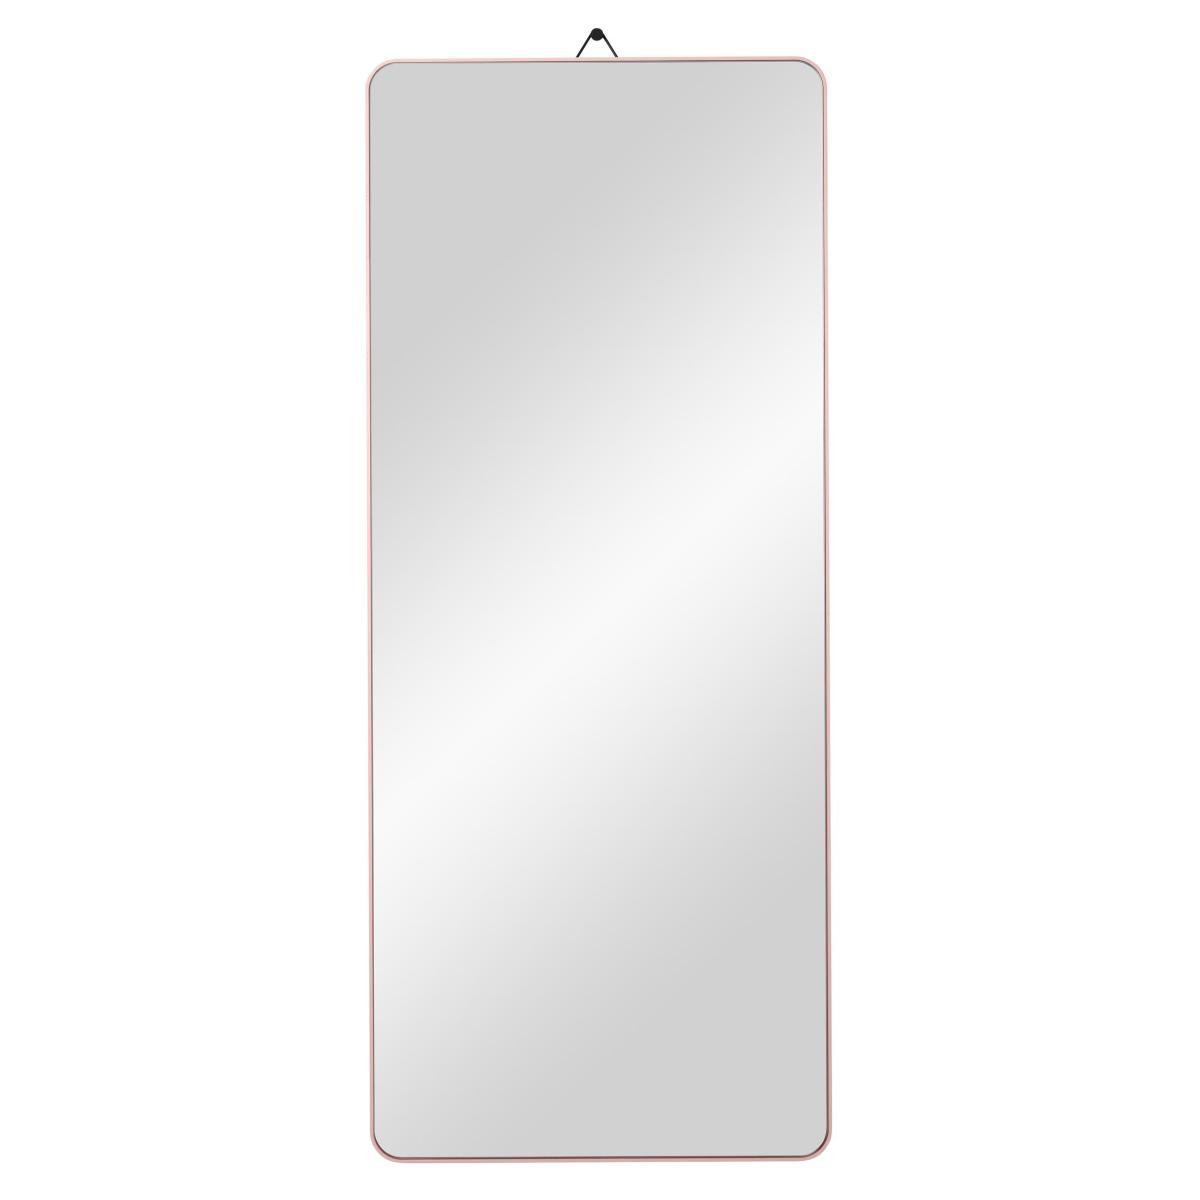 VIEW Spiegel 50 x 120 cm Eiche altrosa